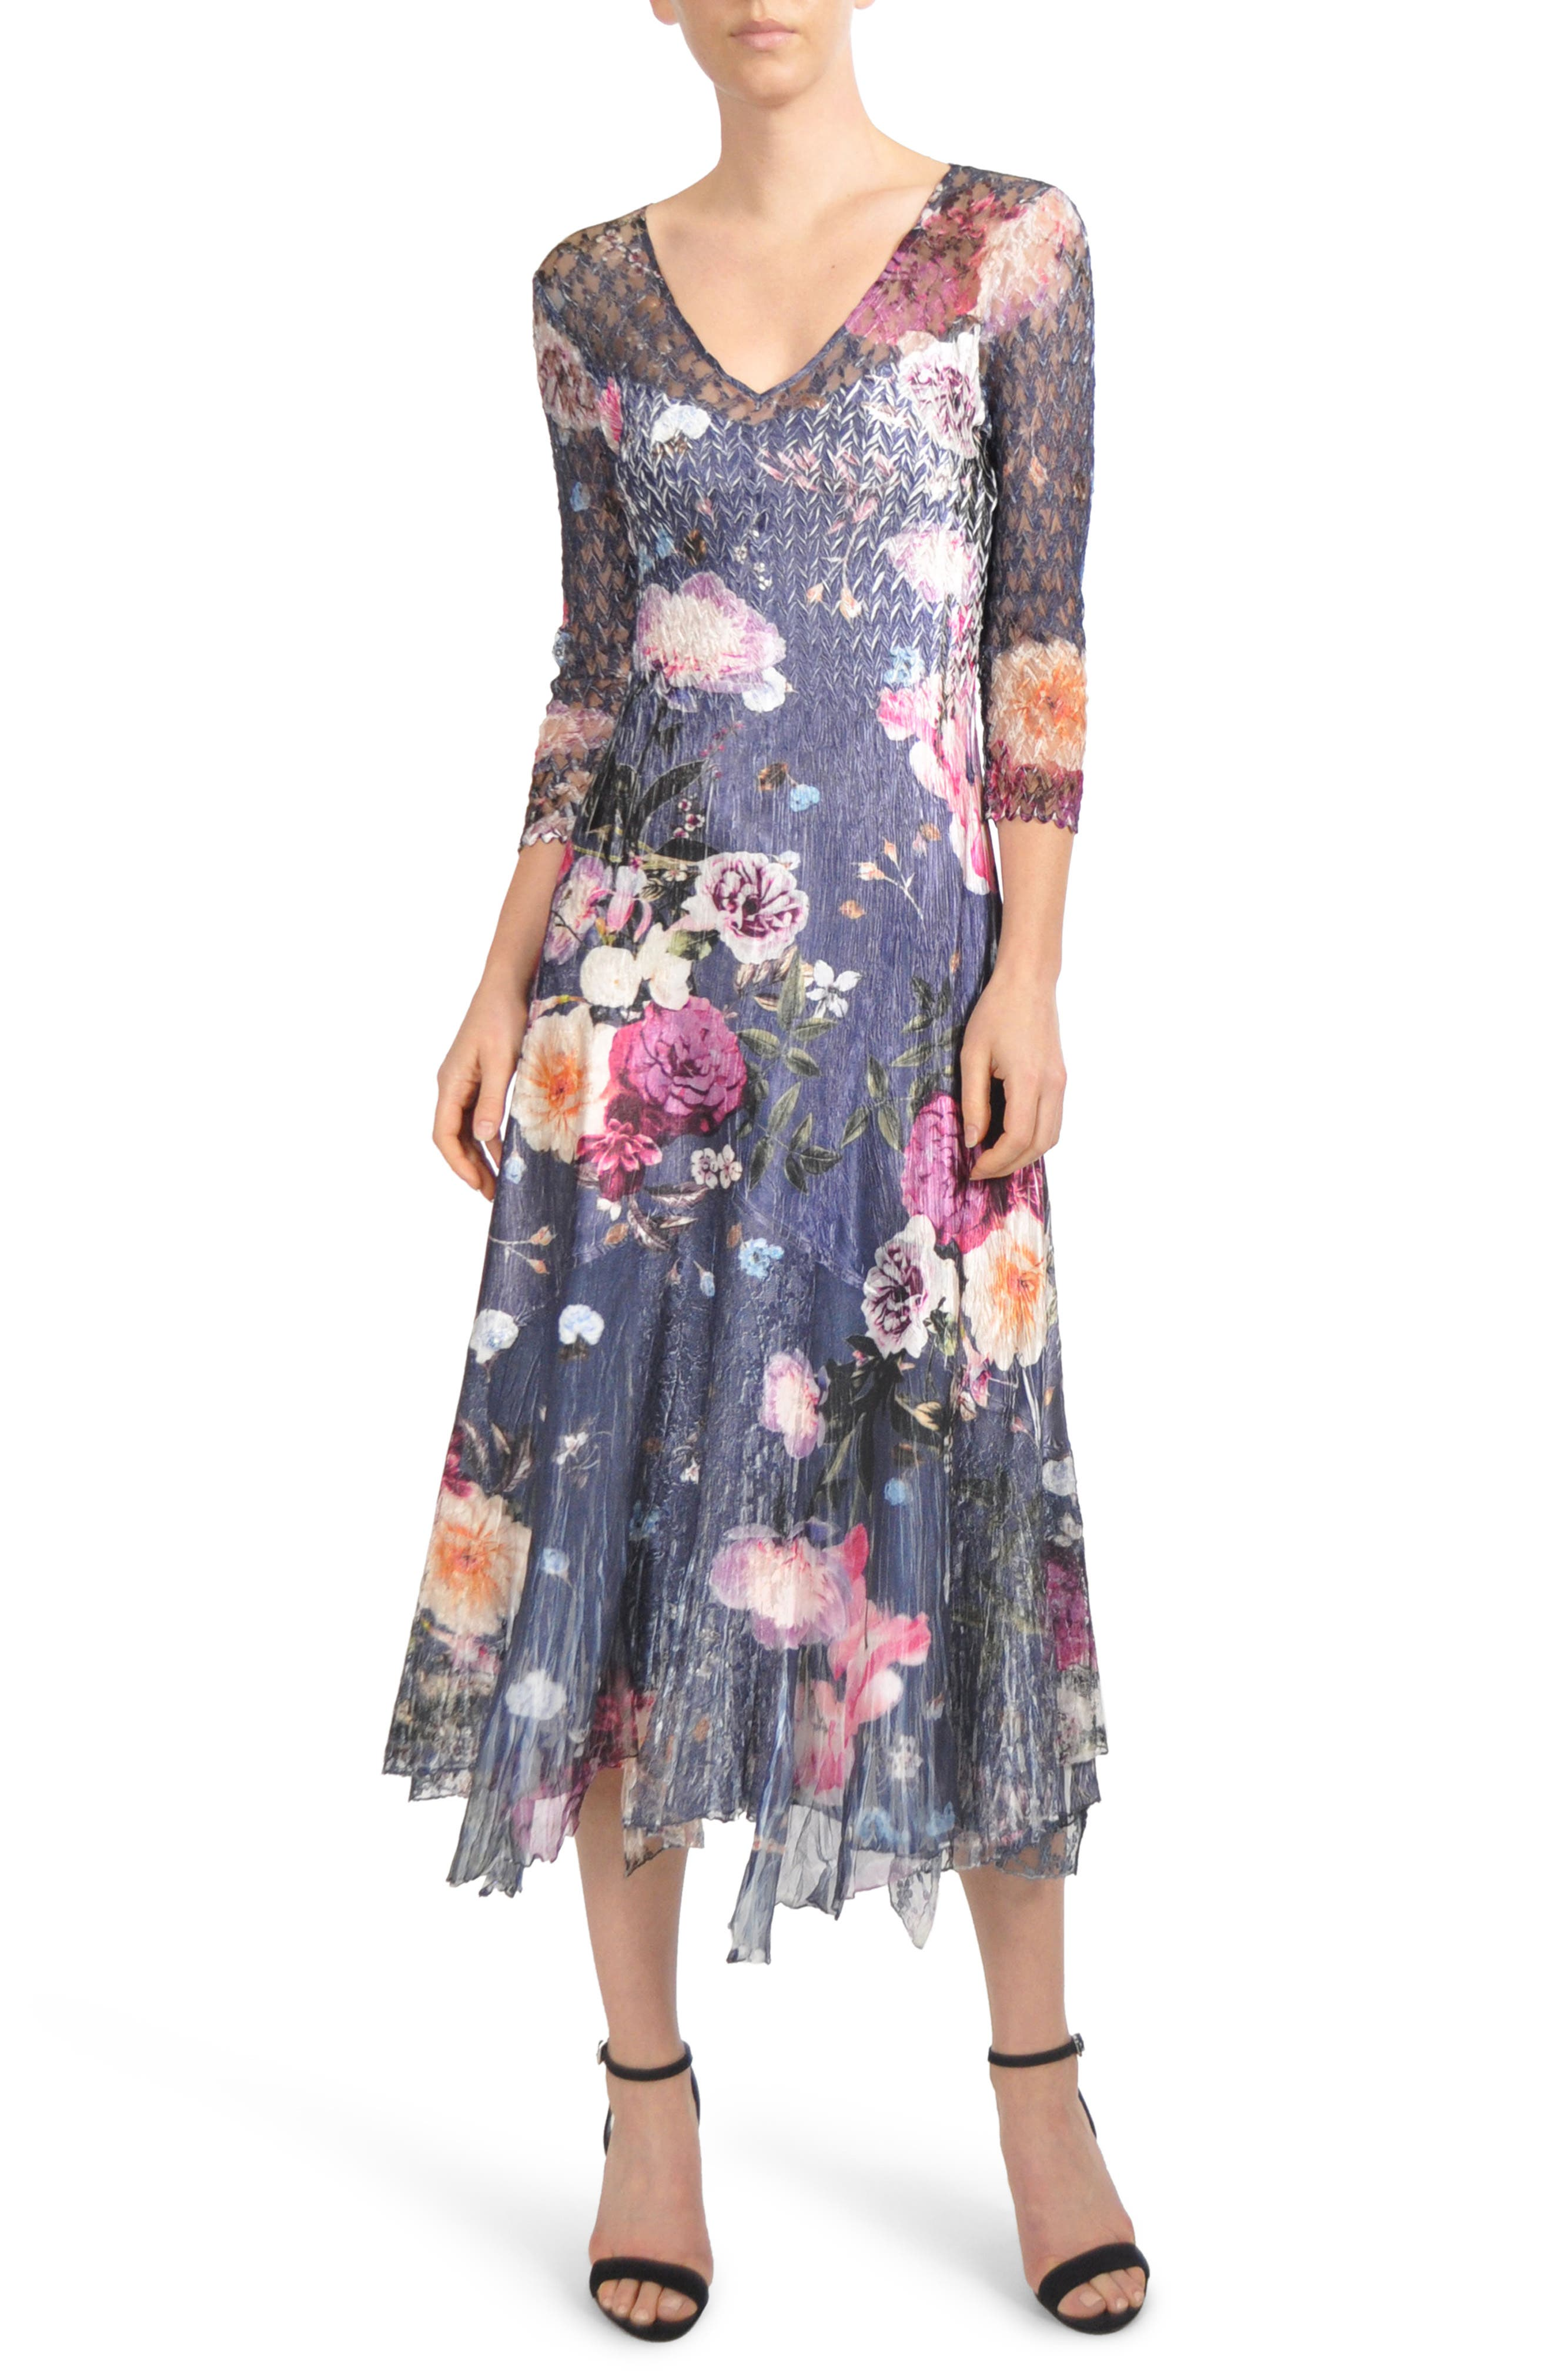 Alternate Image 1 Selected - Komarov Foral Print Lace Inset Dress (Regular & Petite)